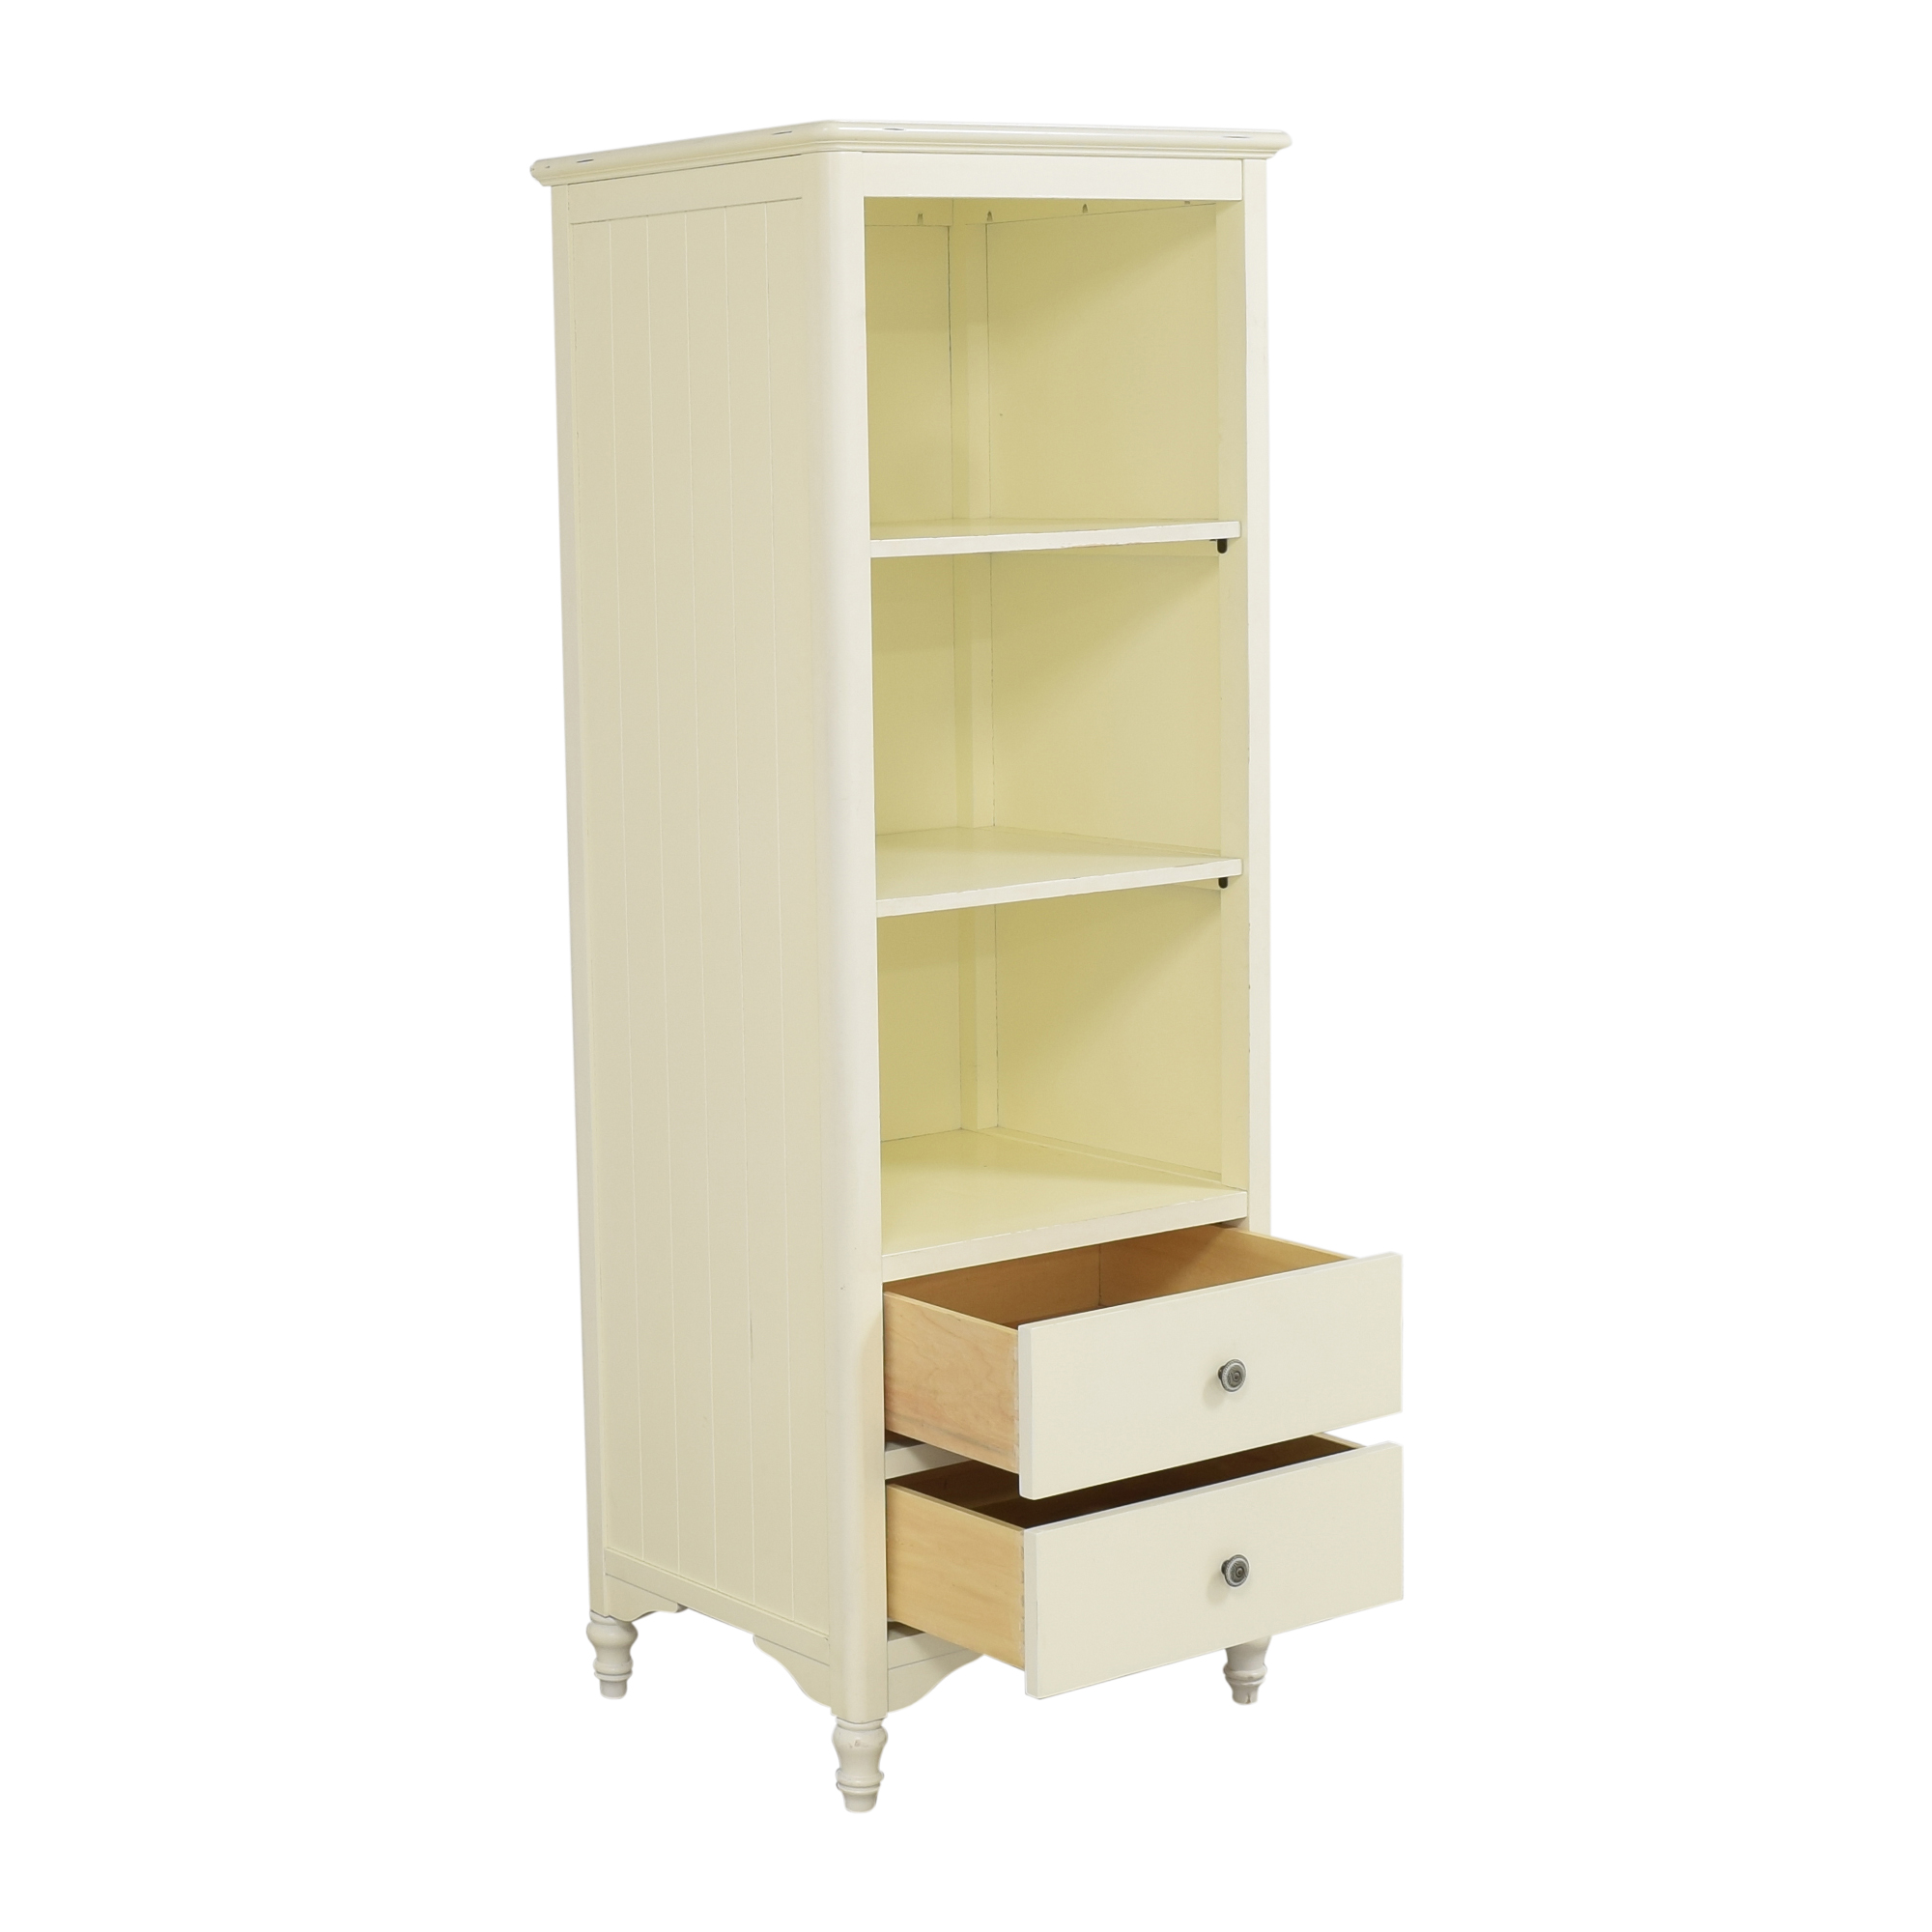 Two Drawer Bookcase Storage